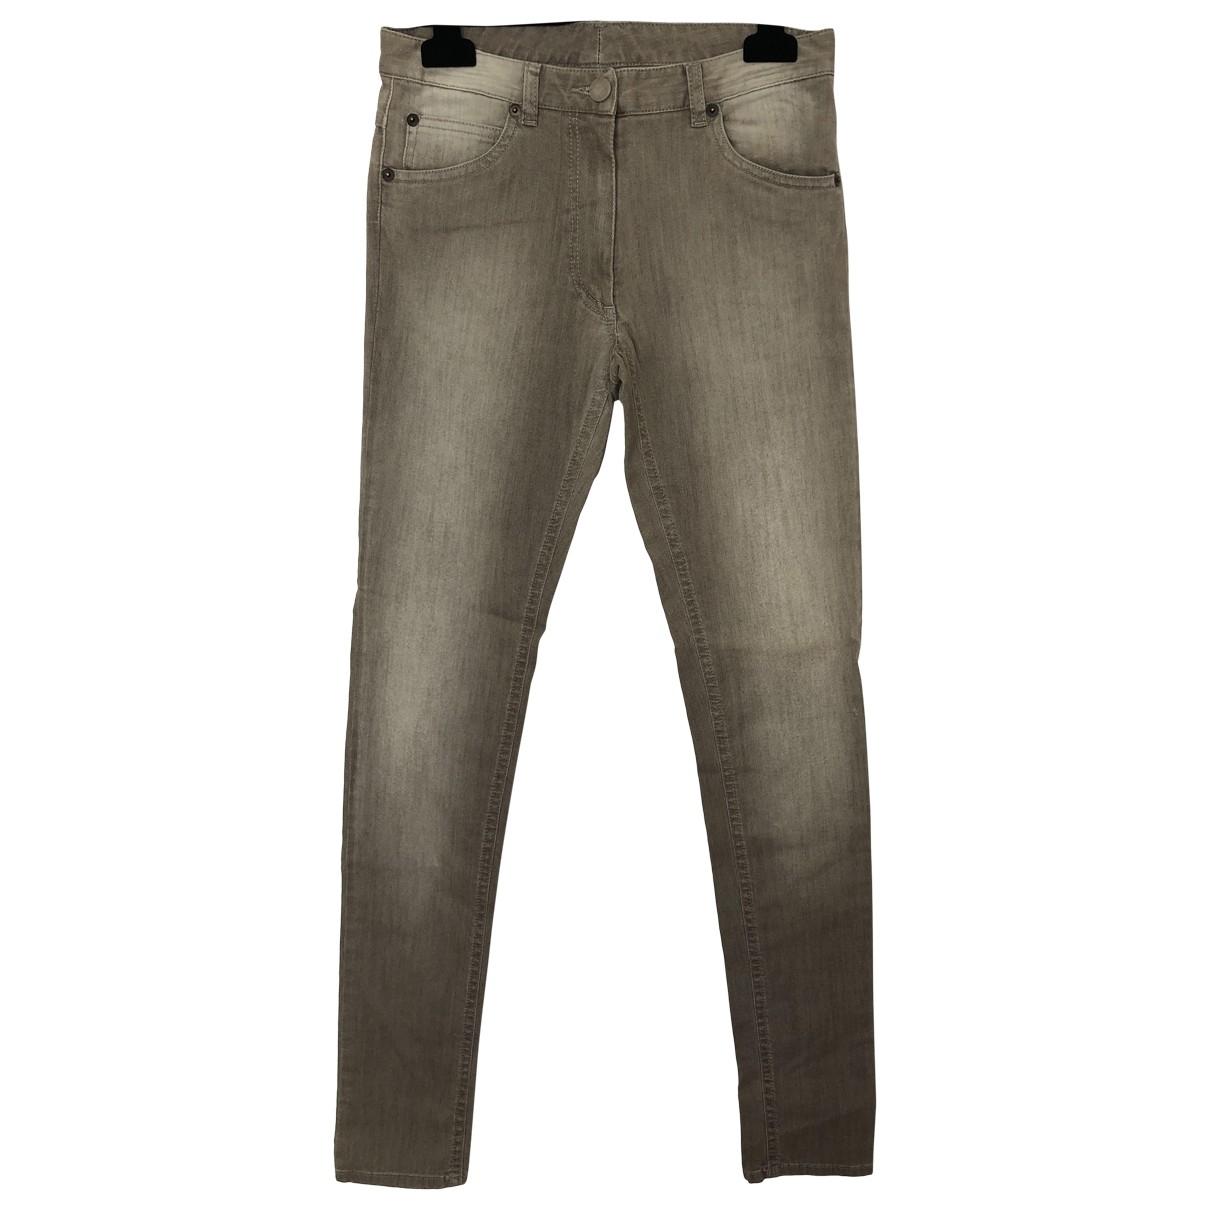 Maison Martin Margiela \N Grey Denim - Jeans Trousers for Women 40 IT